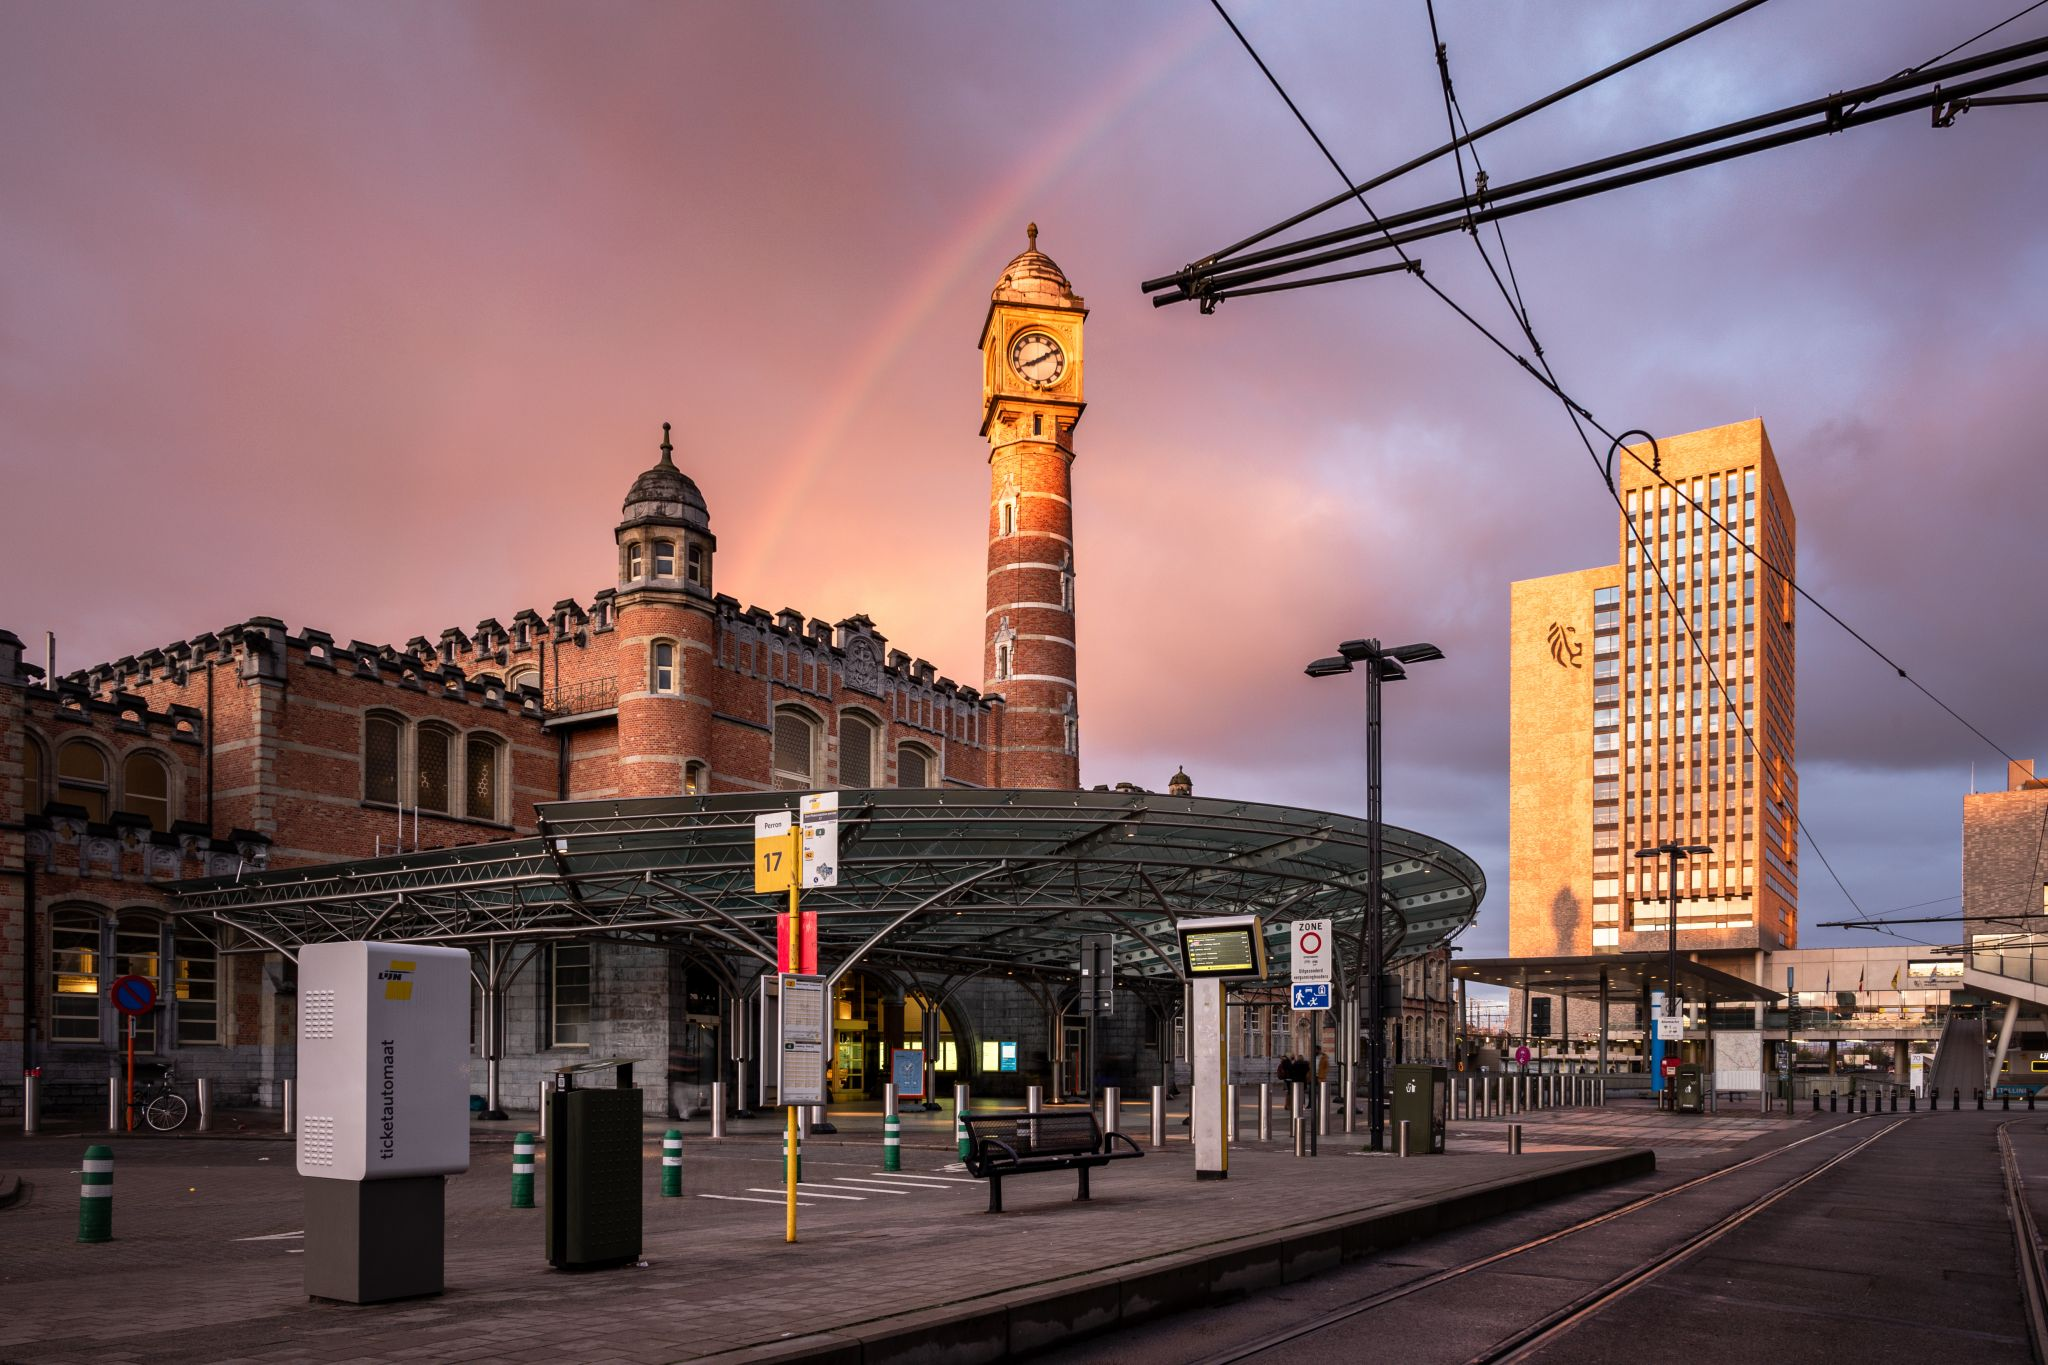 Ghent Sint Pieters Railway Station, Belgium